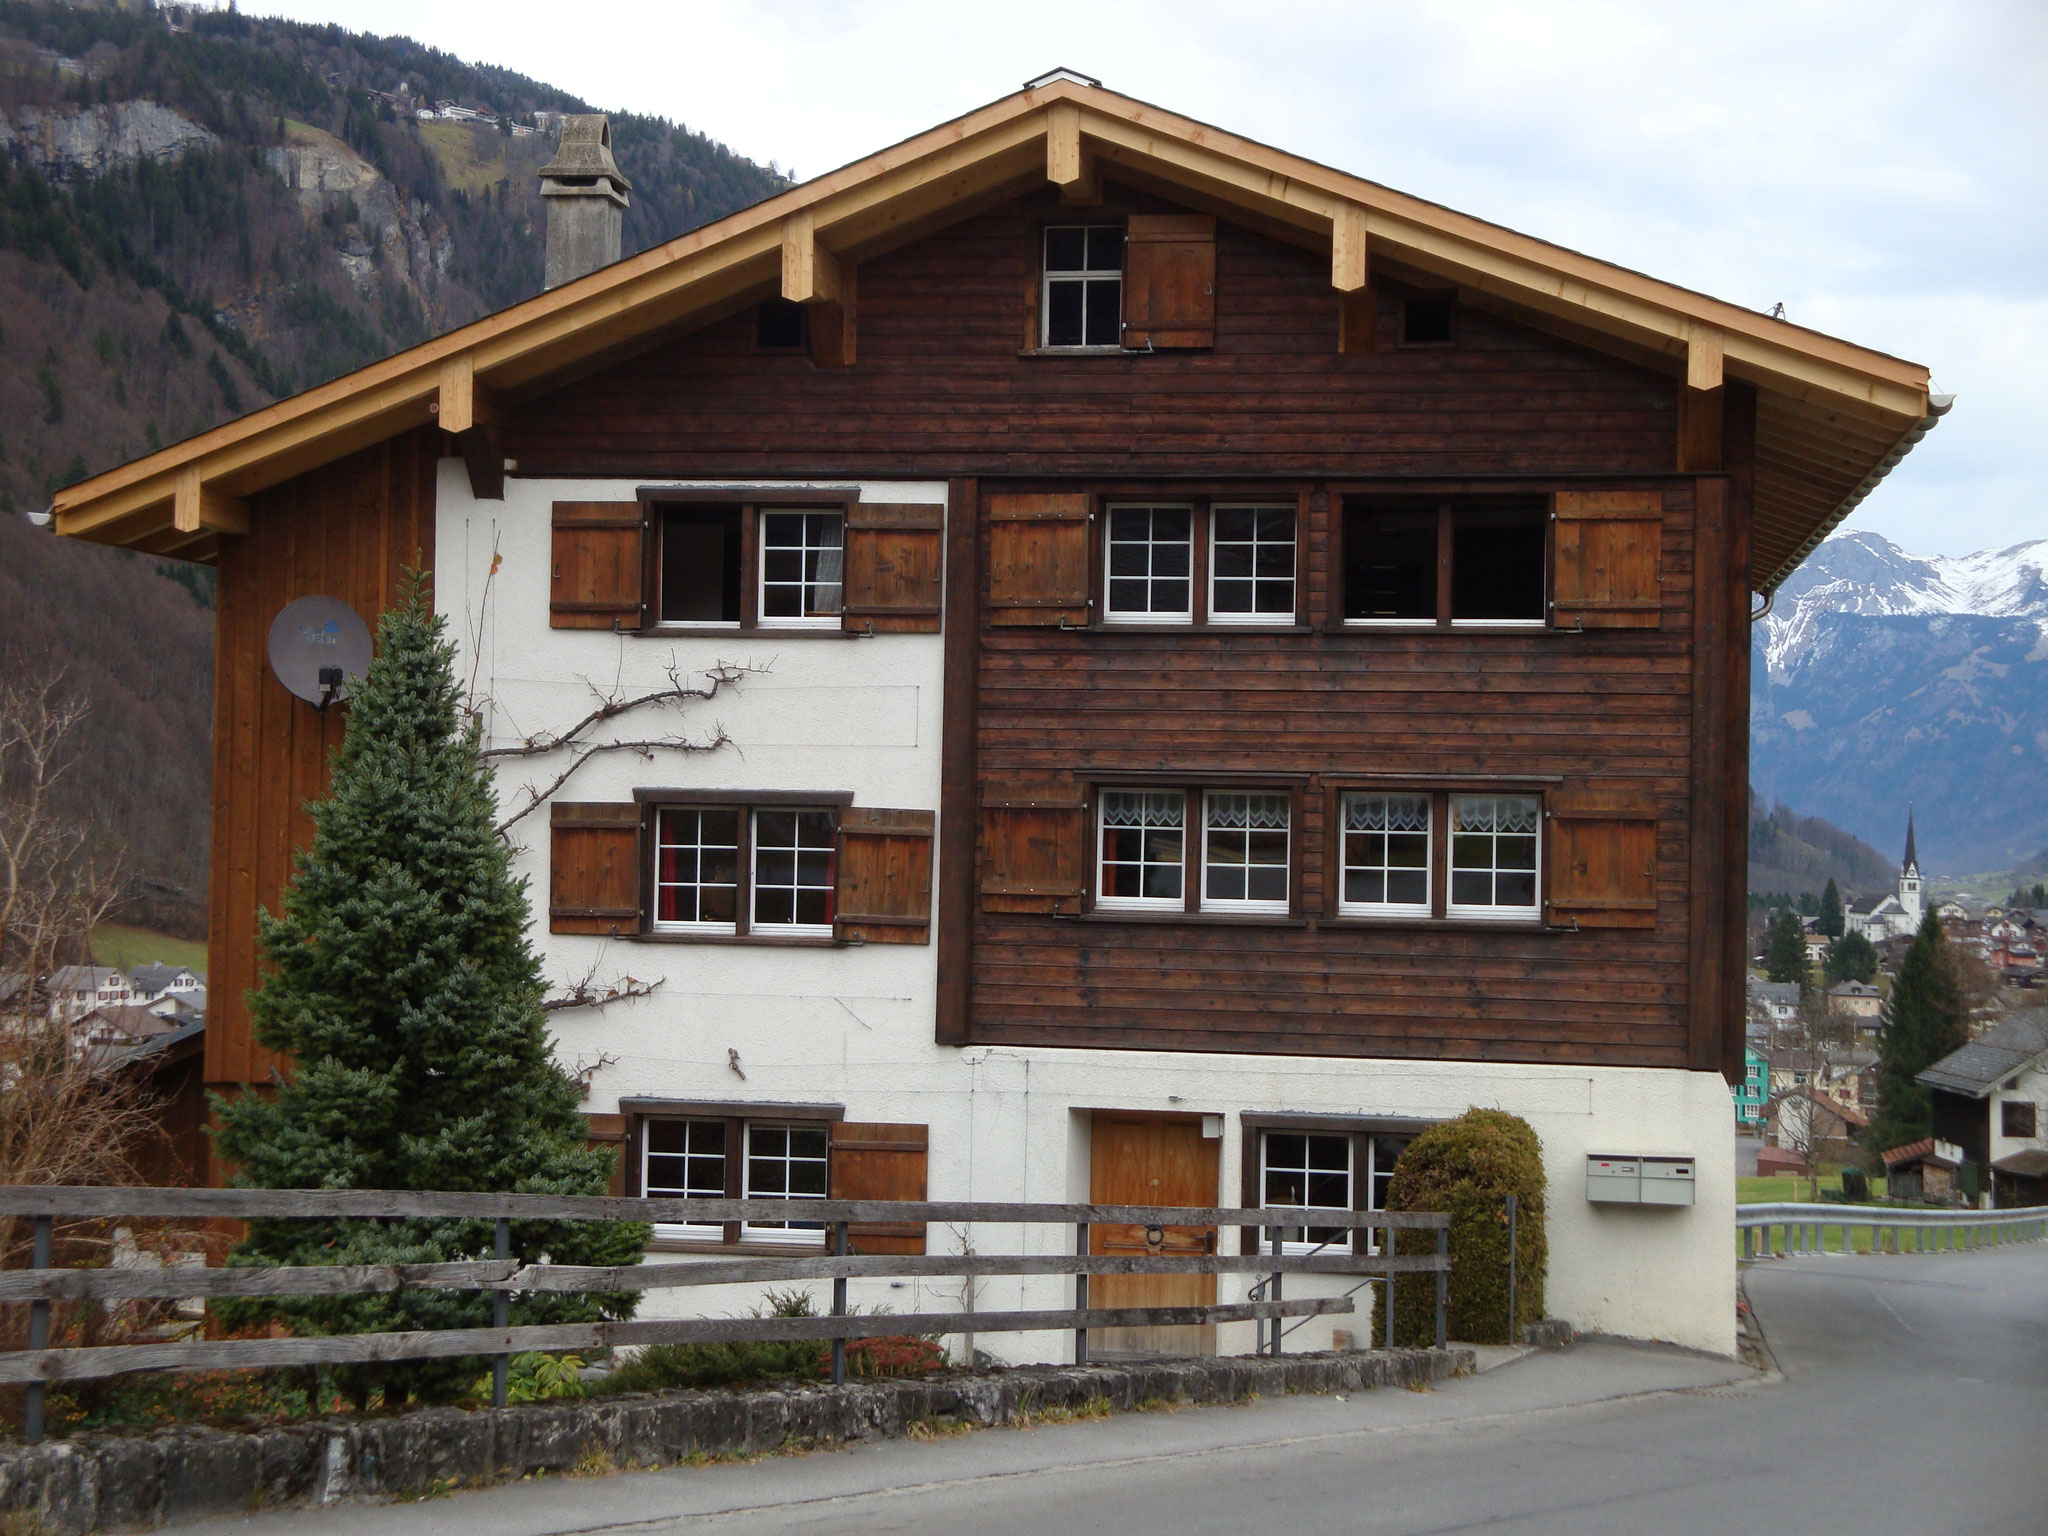 Einfamilienhaus nachher, Linthal